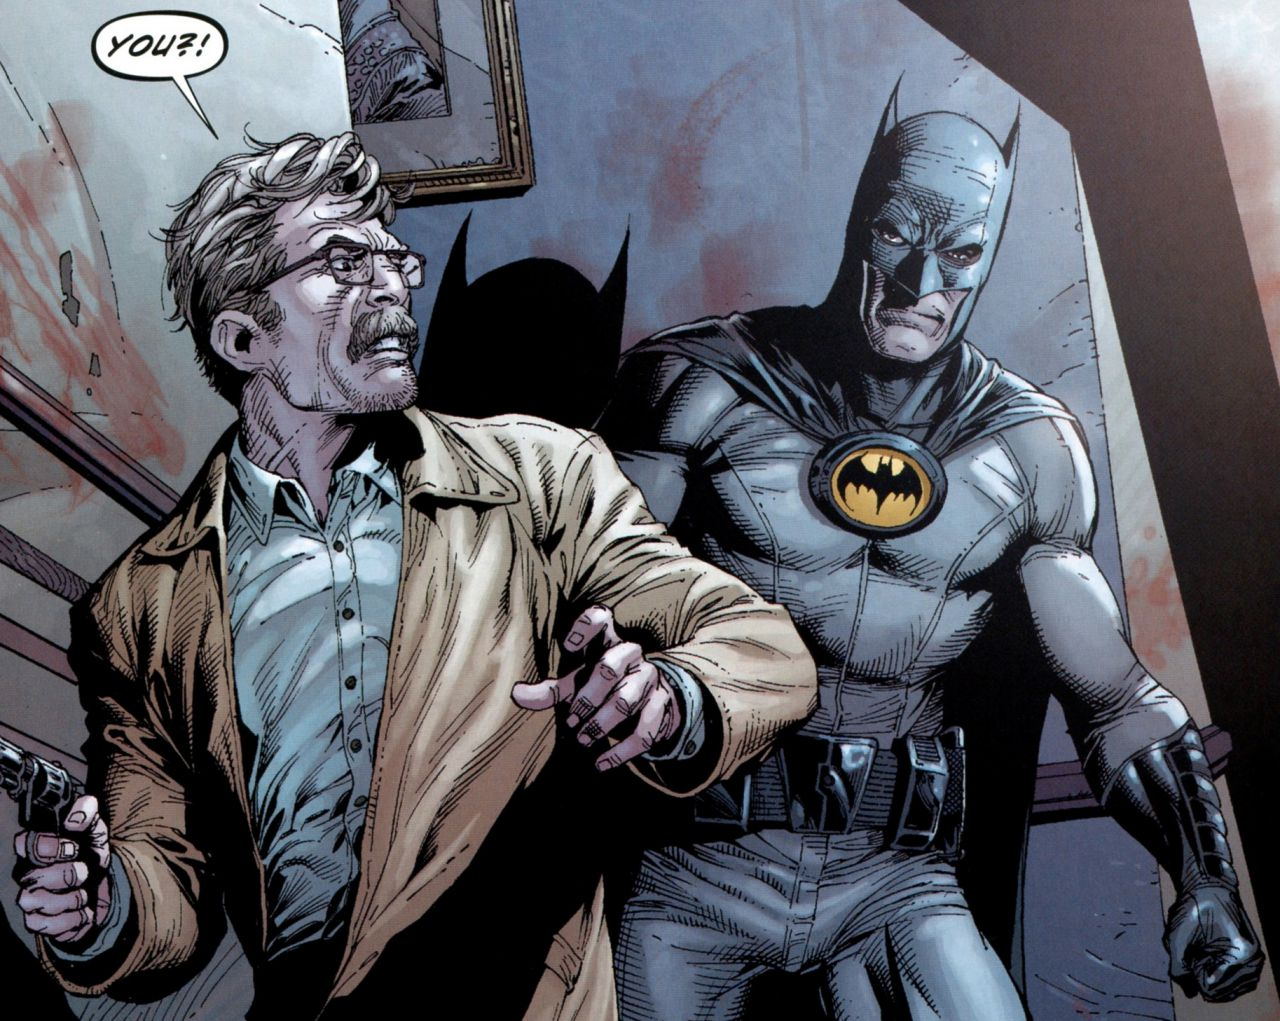 Commissioner Gordon and Batman